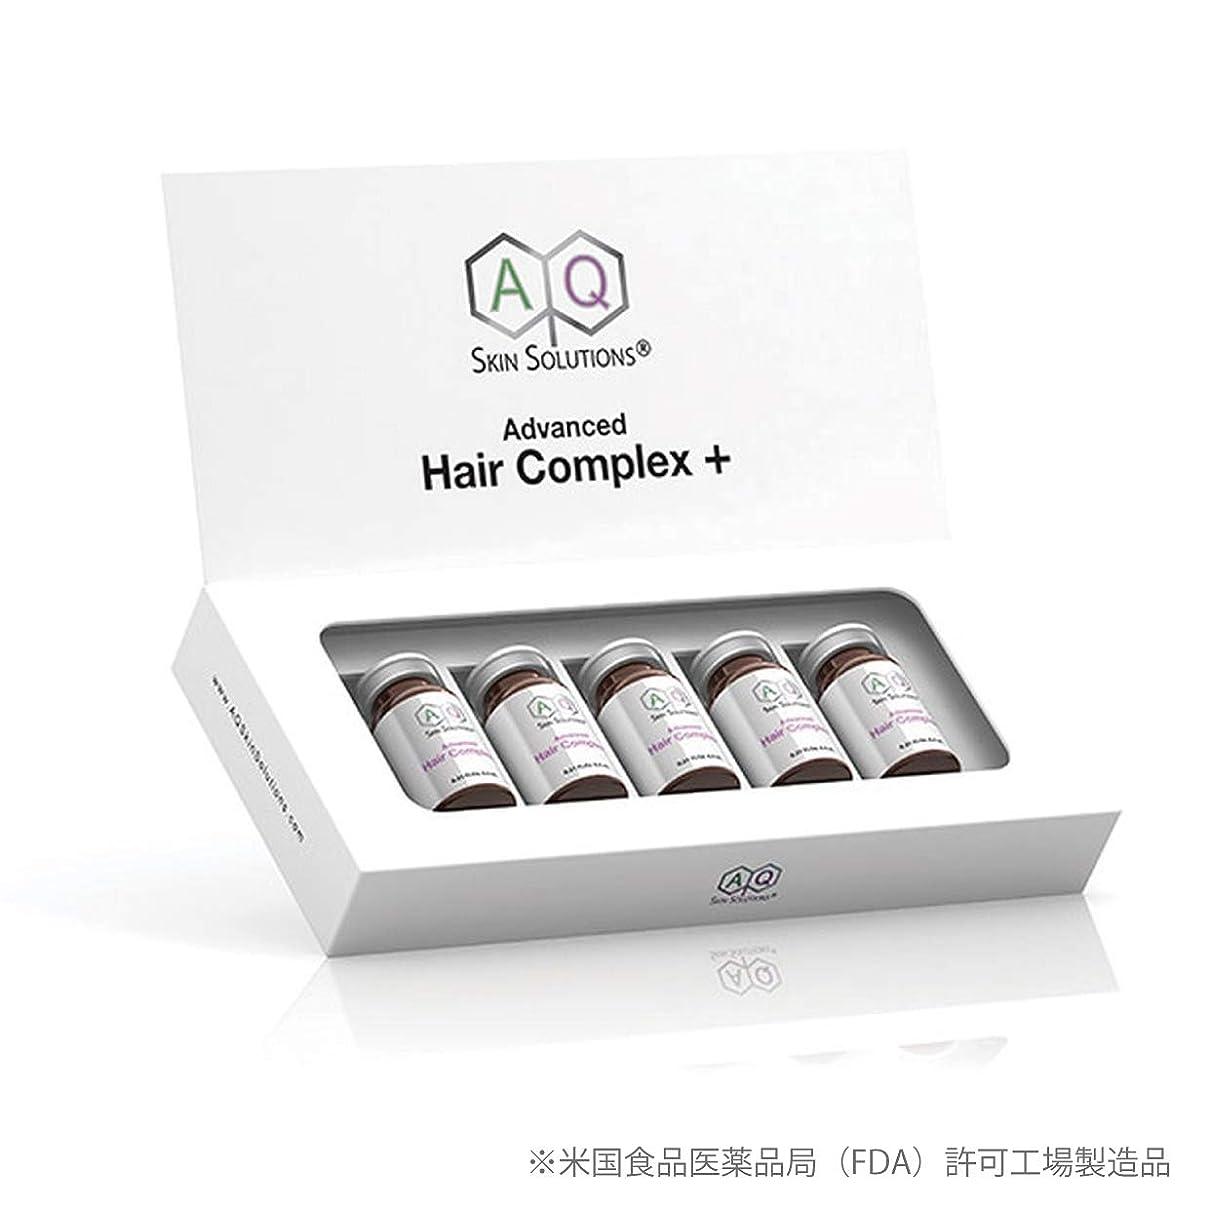 Advanced Hair Complex アドバンスト ヘアーコンプレックス 育毛剤 GF(グロースファクター/細胞成長因子)成分配合